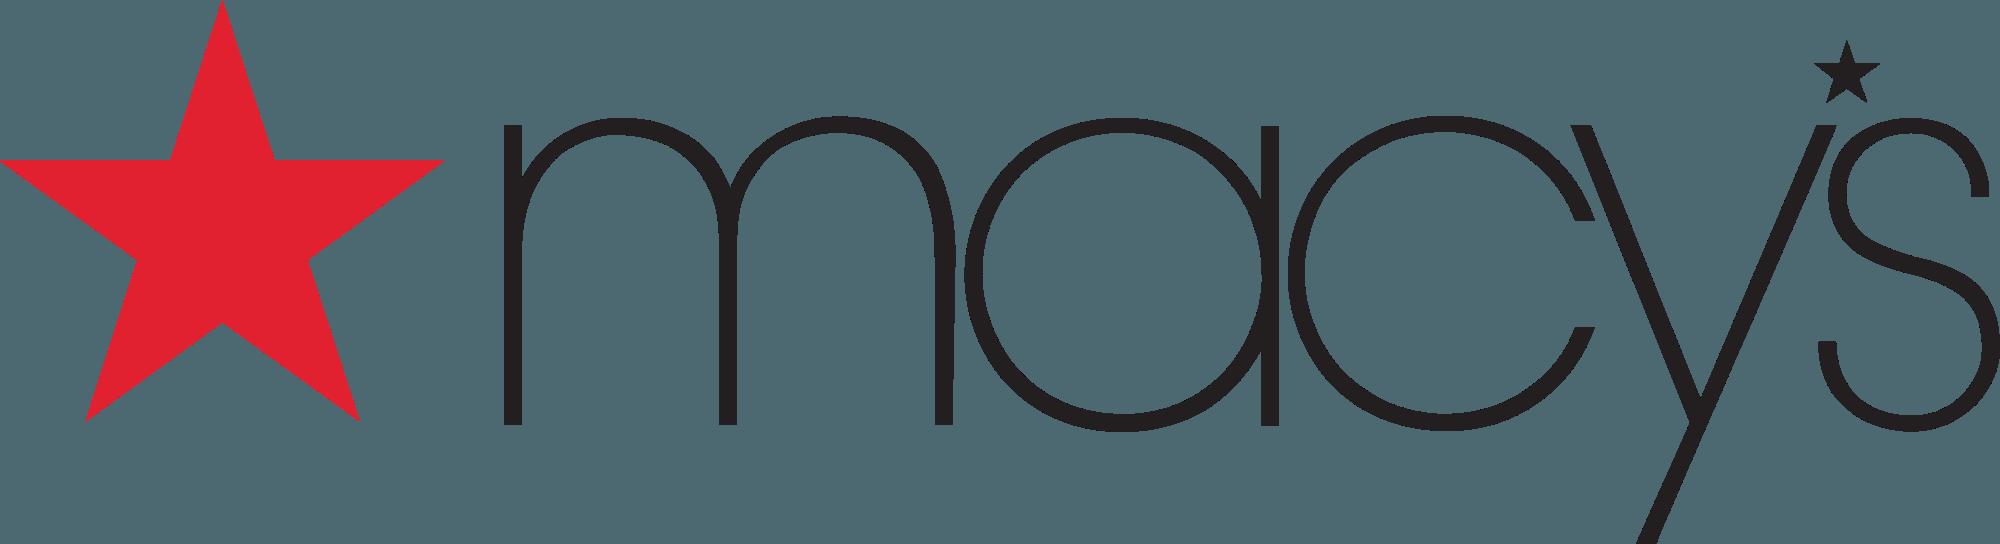 Macy's Logo - LogoDix